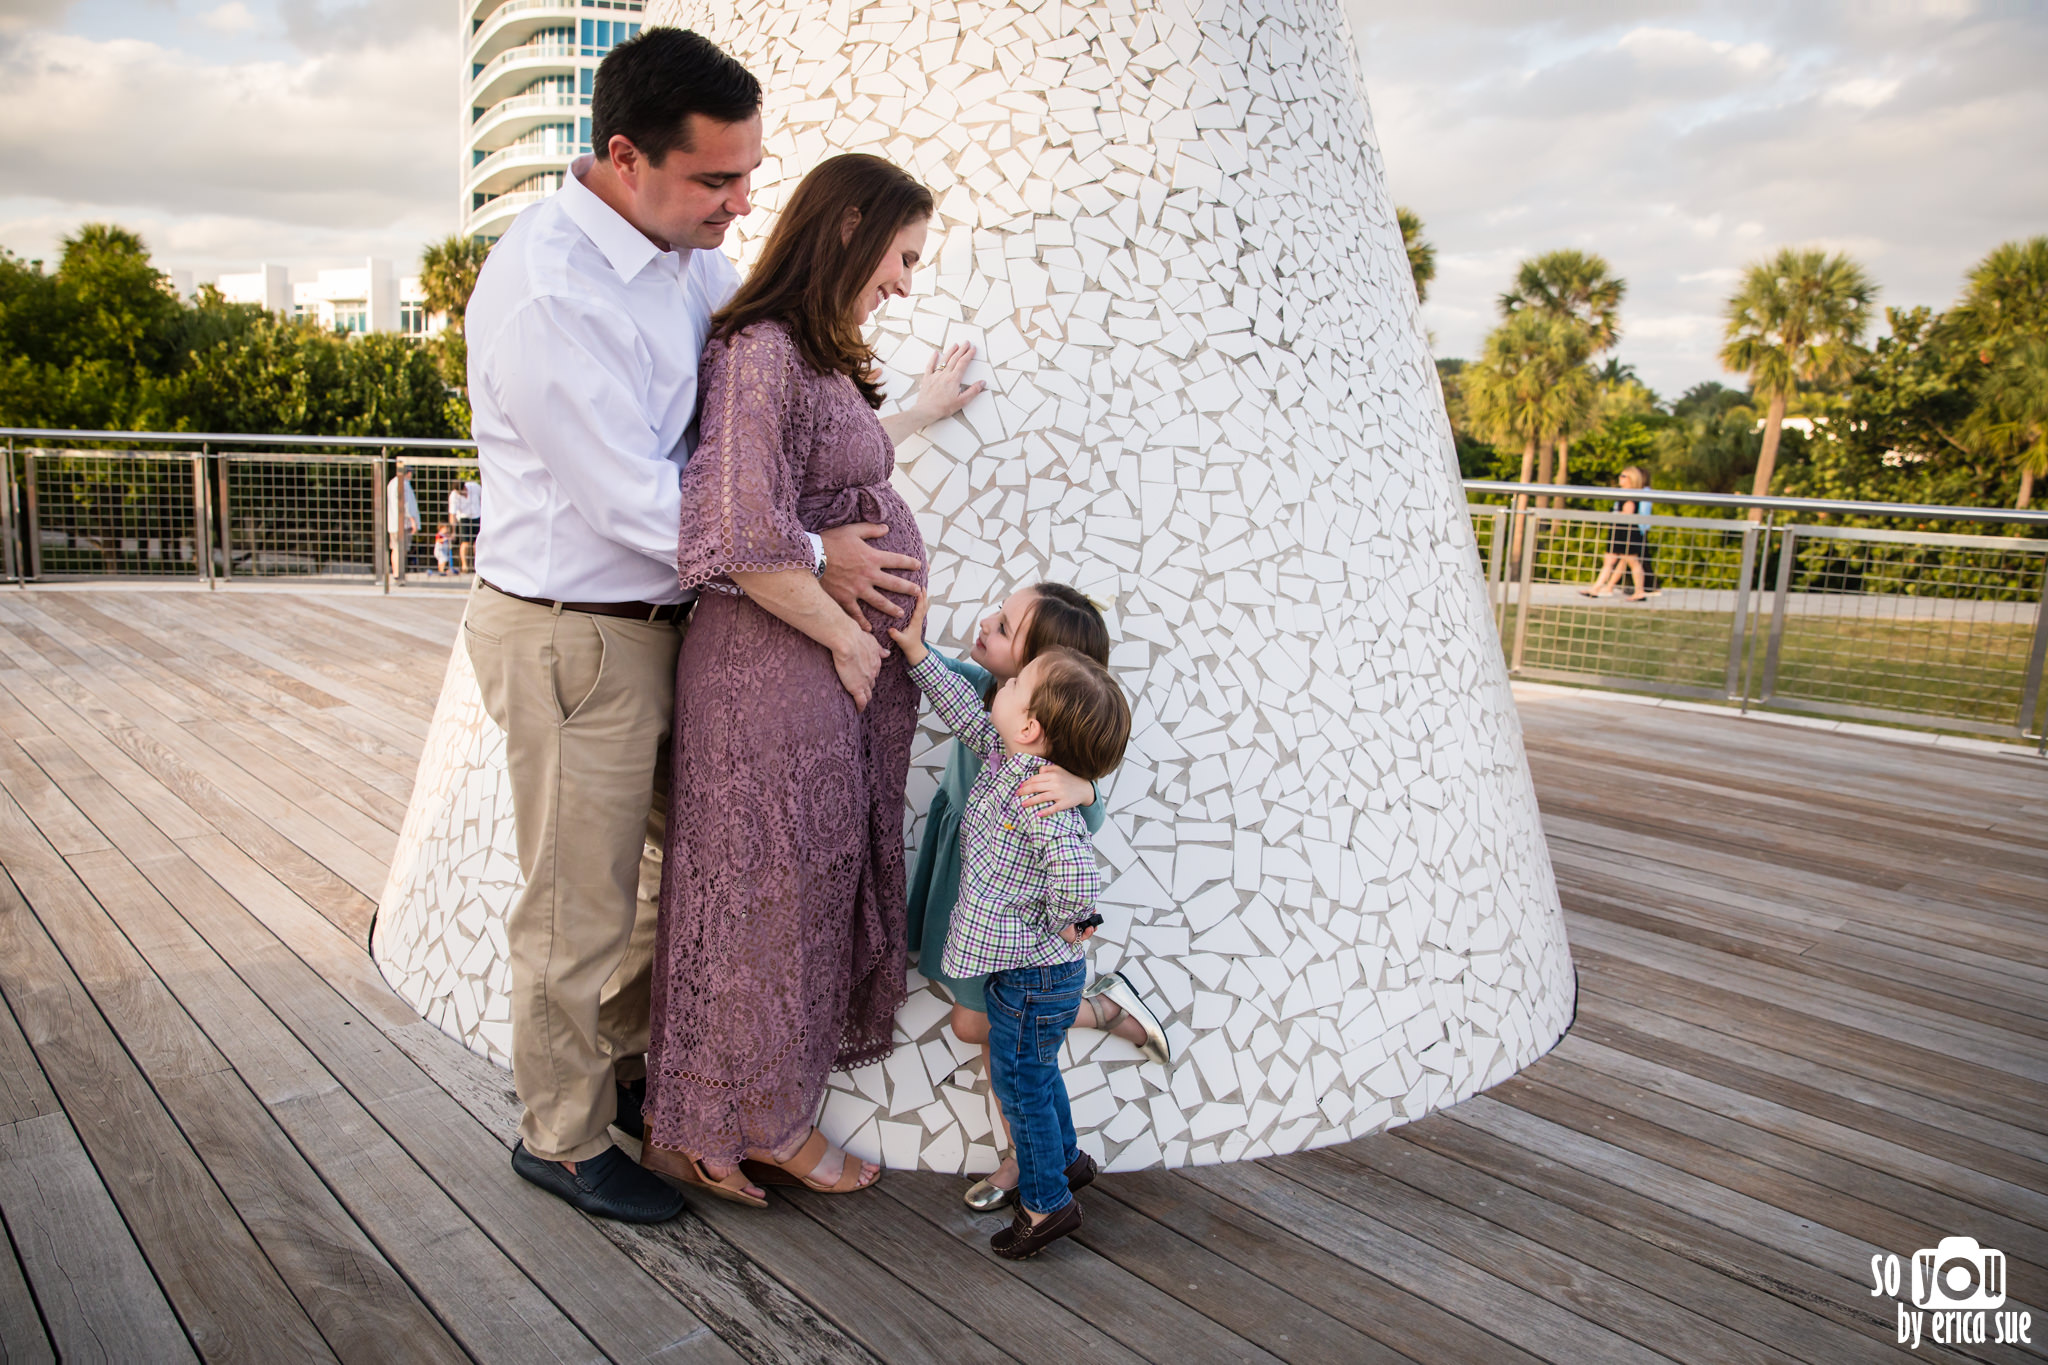 so-you-by-erica-sue-miami-maternity-photographer-south-pointe-park--2.jpg